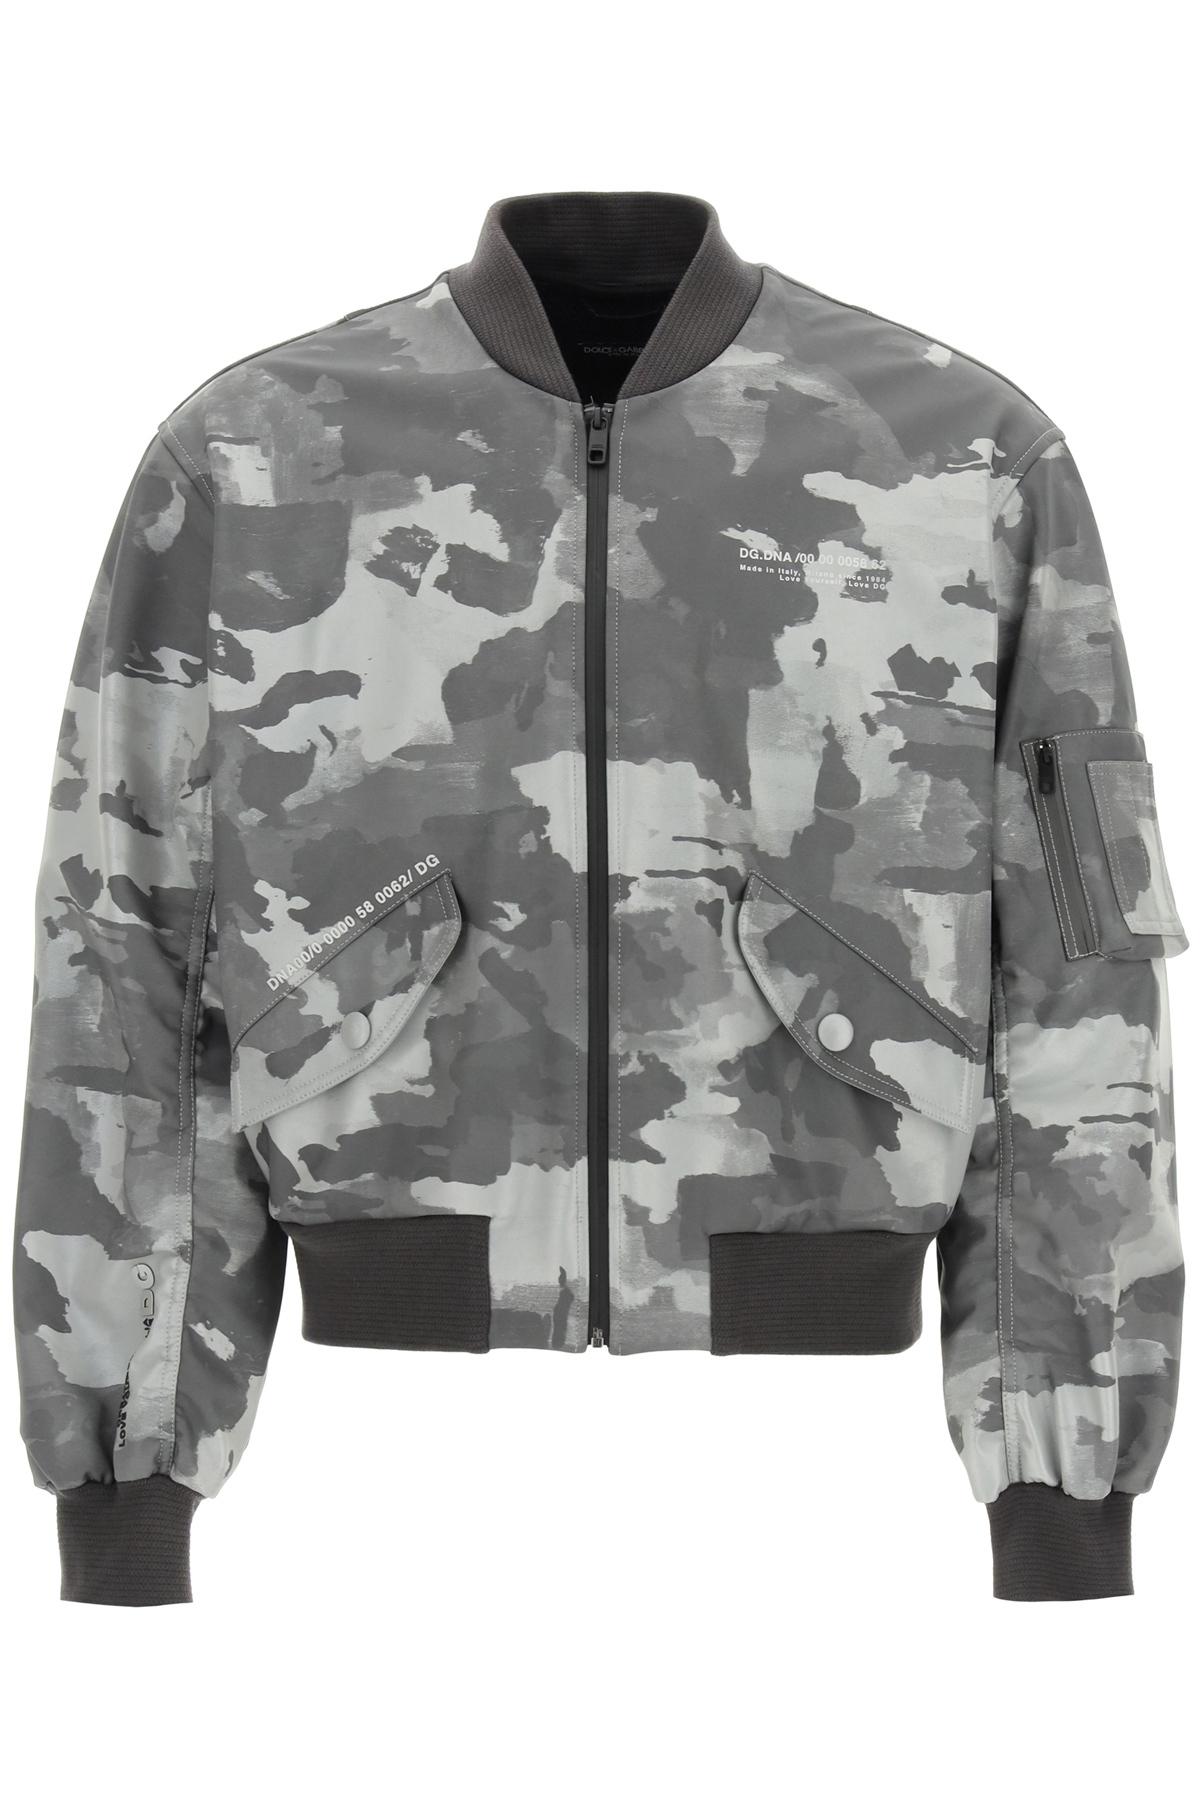 Dolce & gabbana bomber camouflage con logo